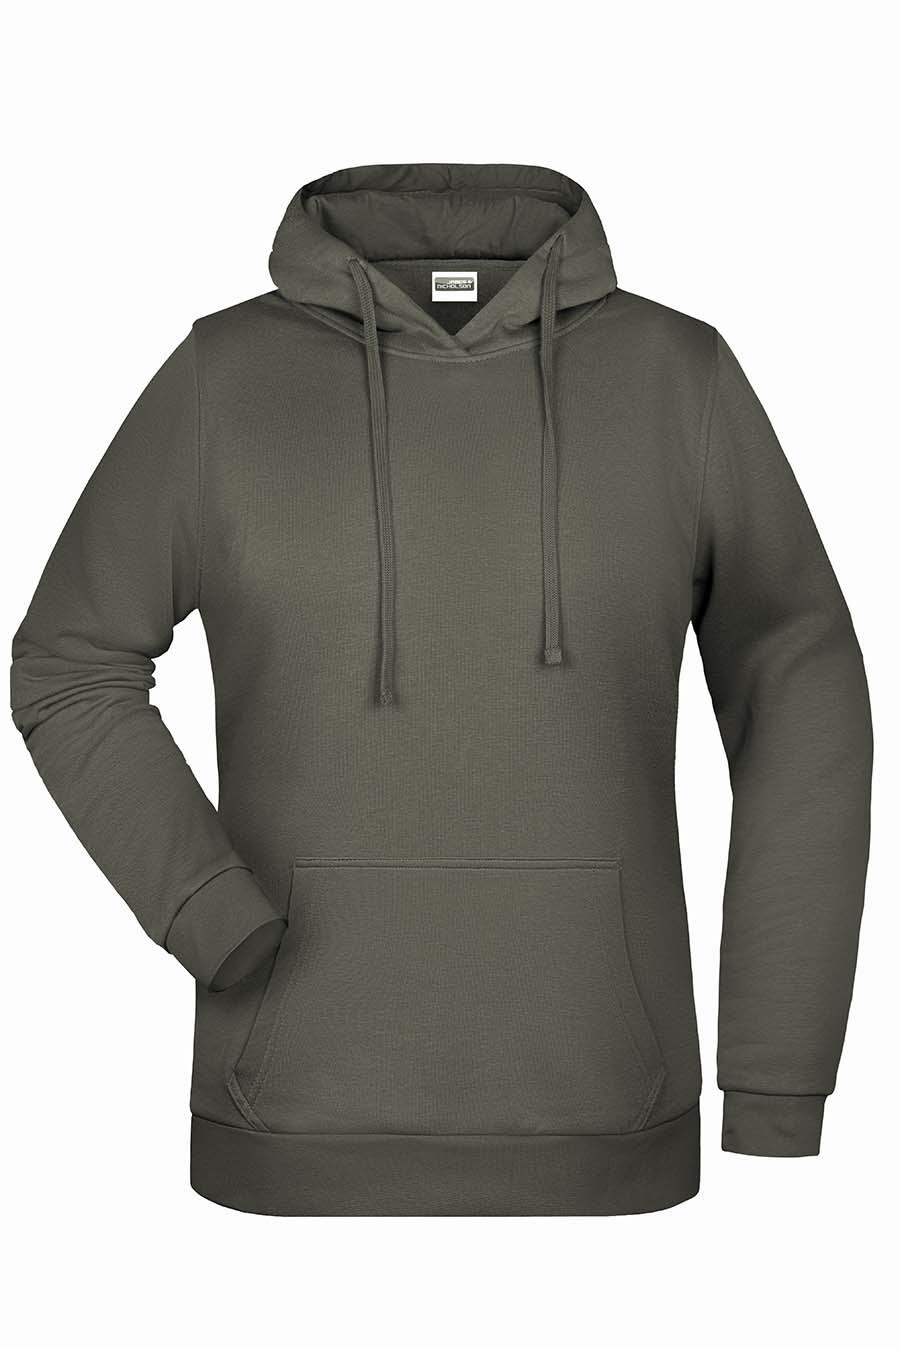 Sweat-shirt capuche femme - 20-1494-5